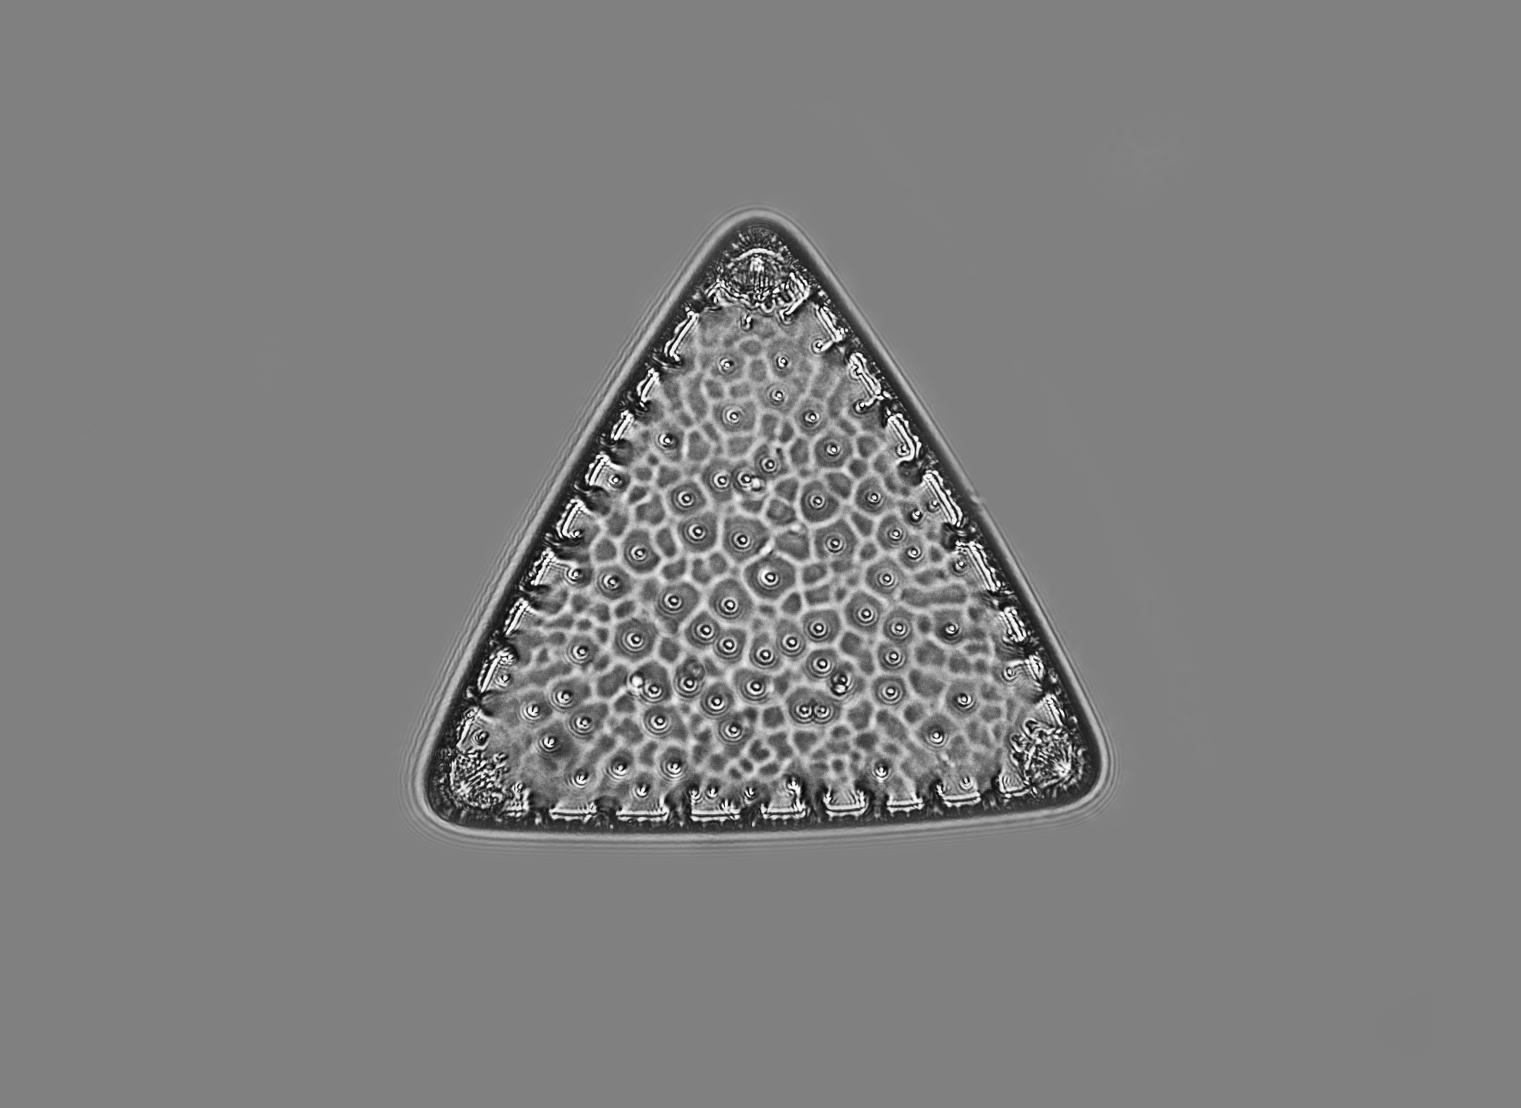 Diatom Moller Zetopan 1